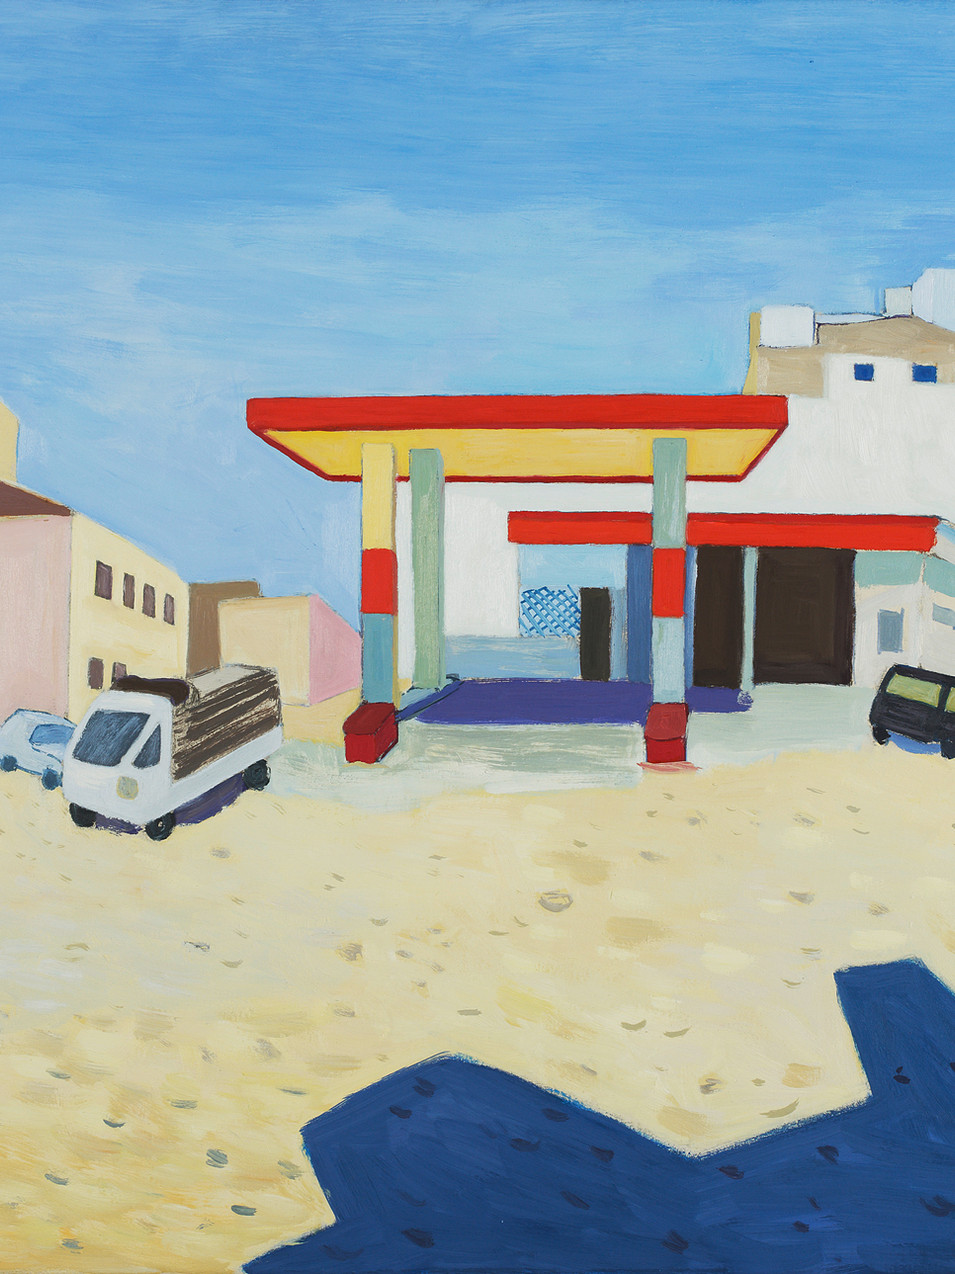 Gudrun Petersdorff | 2011 | Vor der Stadt (Essaouira) | Öl auf Leinwand | gerahmt | Kat. S. 108 |3200 Euro